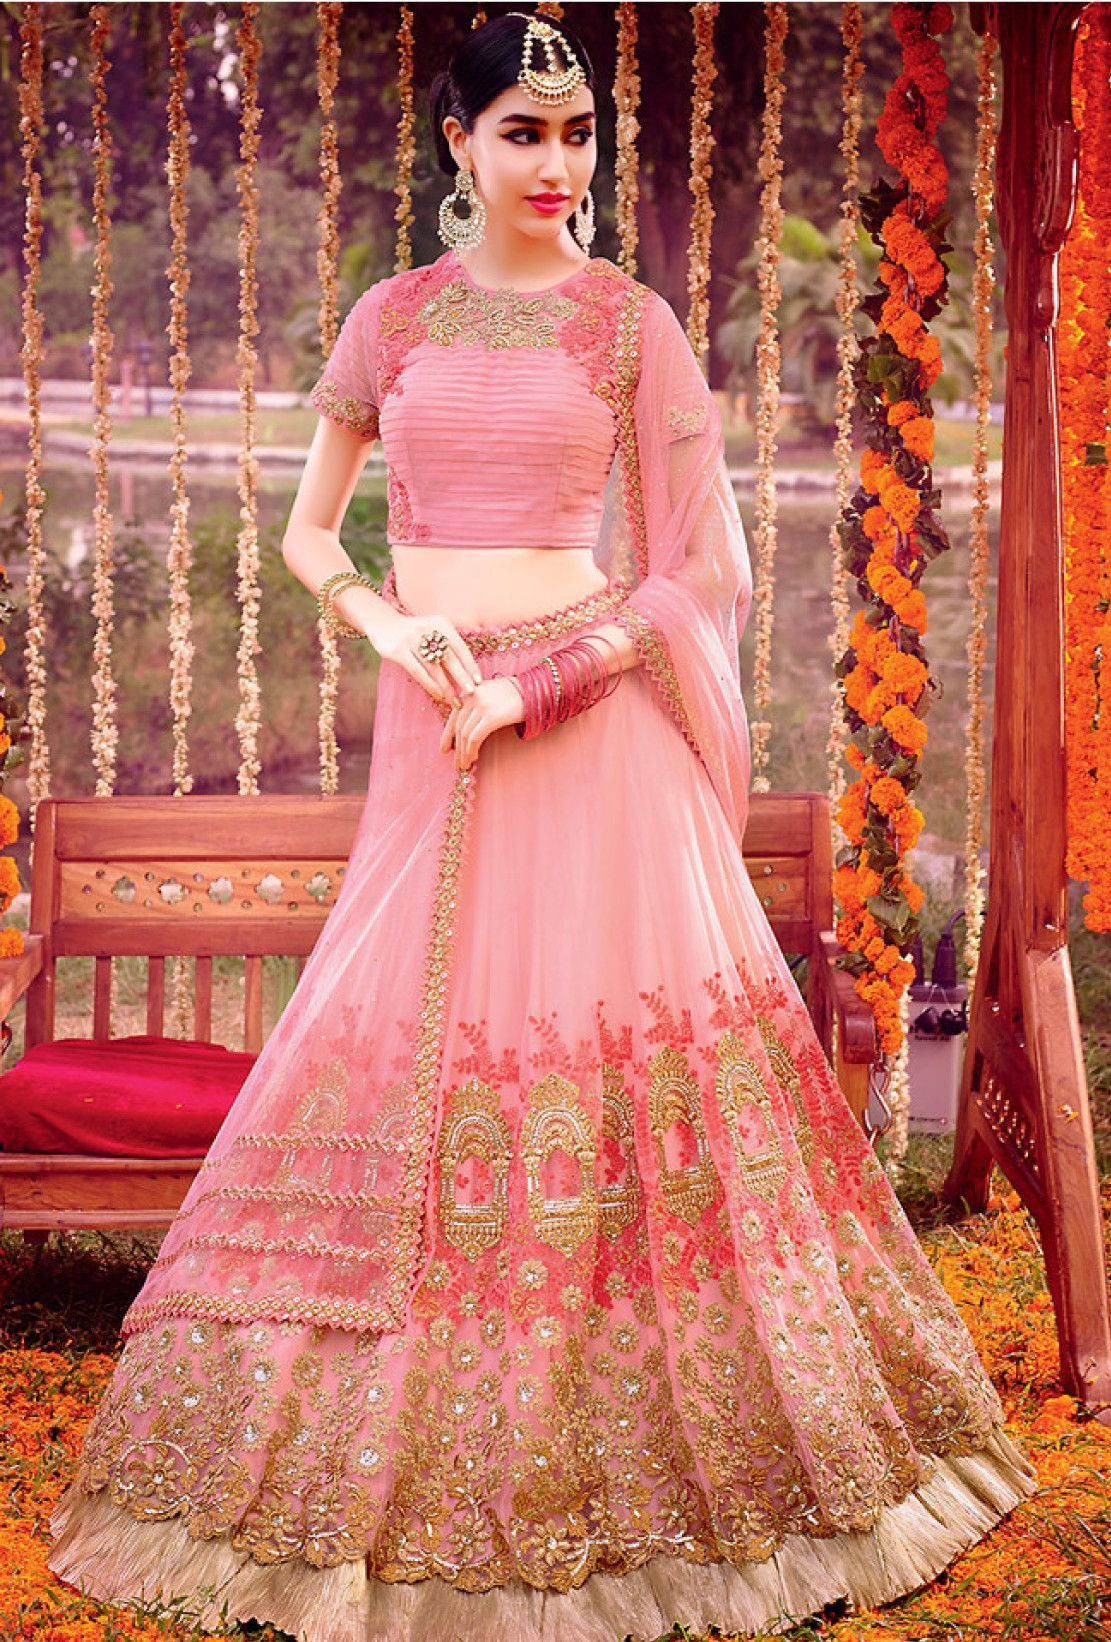 Pink designer party wear lehengha - Desi Royale - 1 | d | Pinterest ...